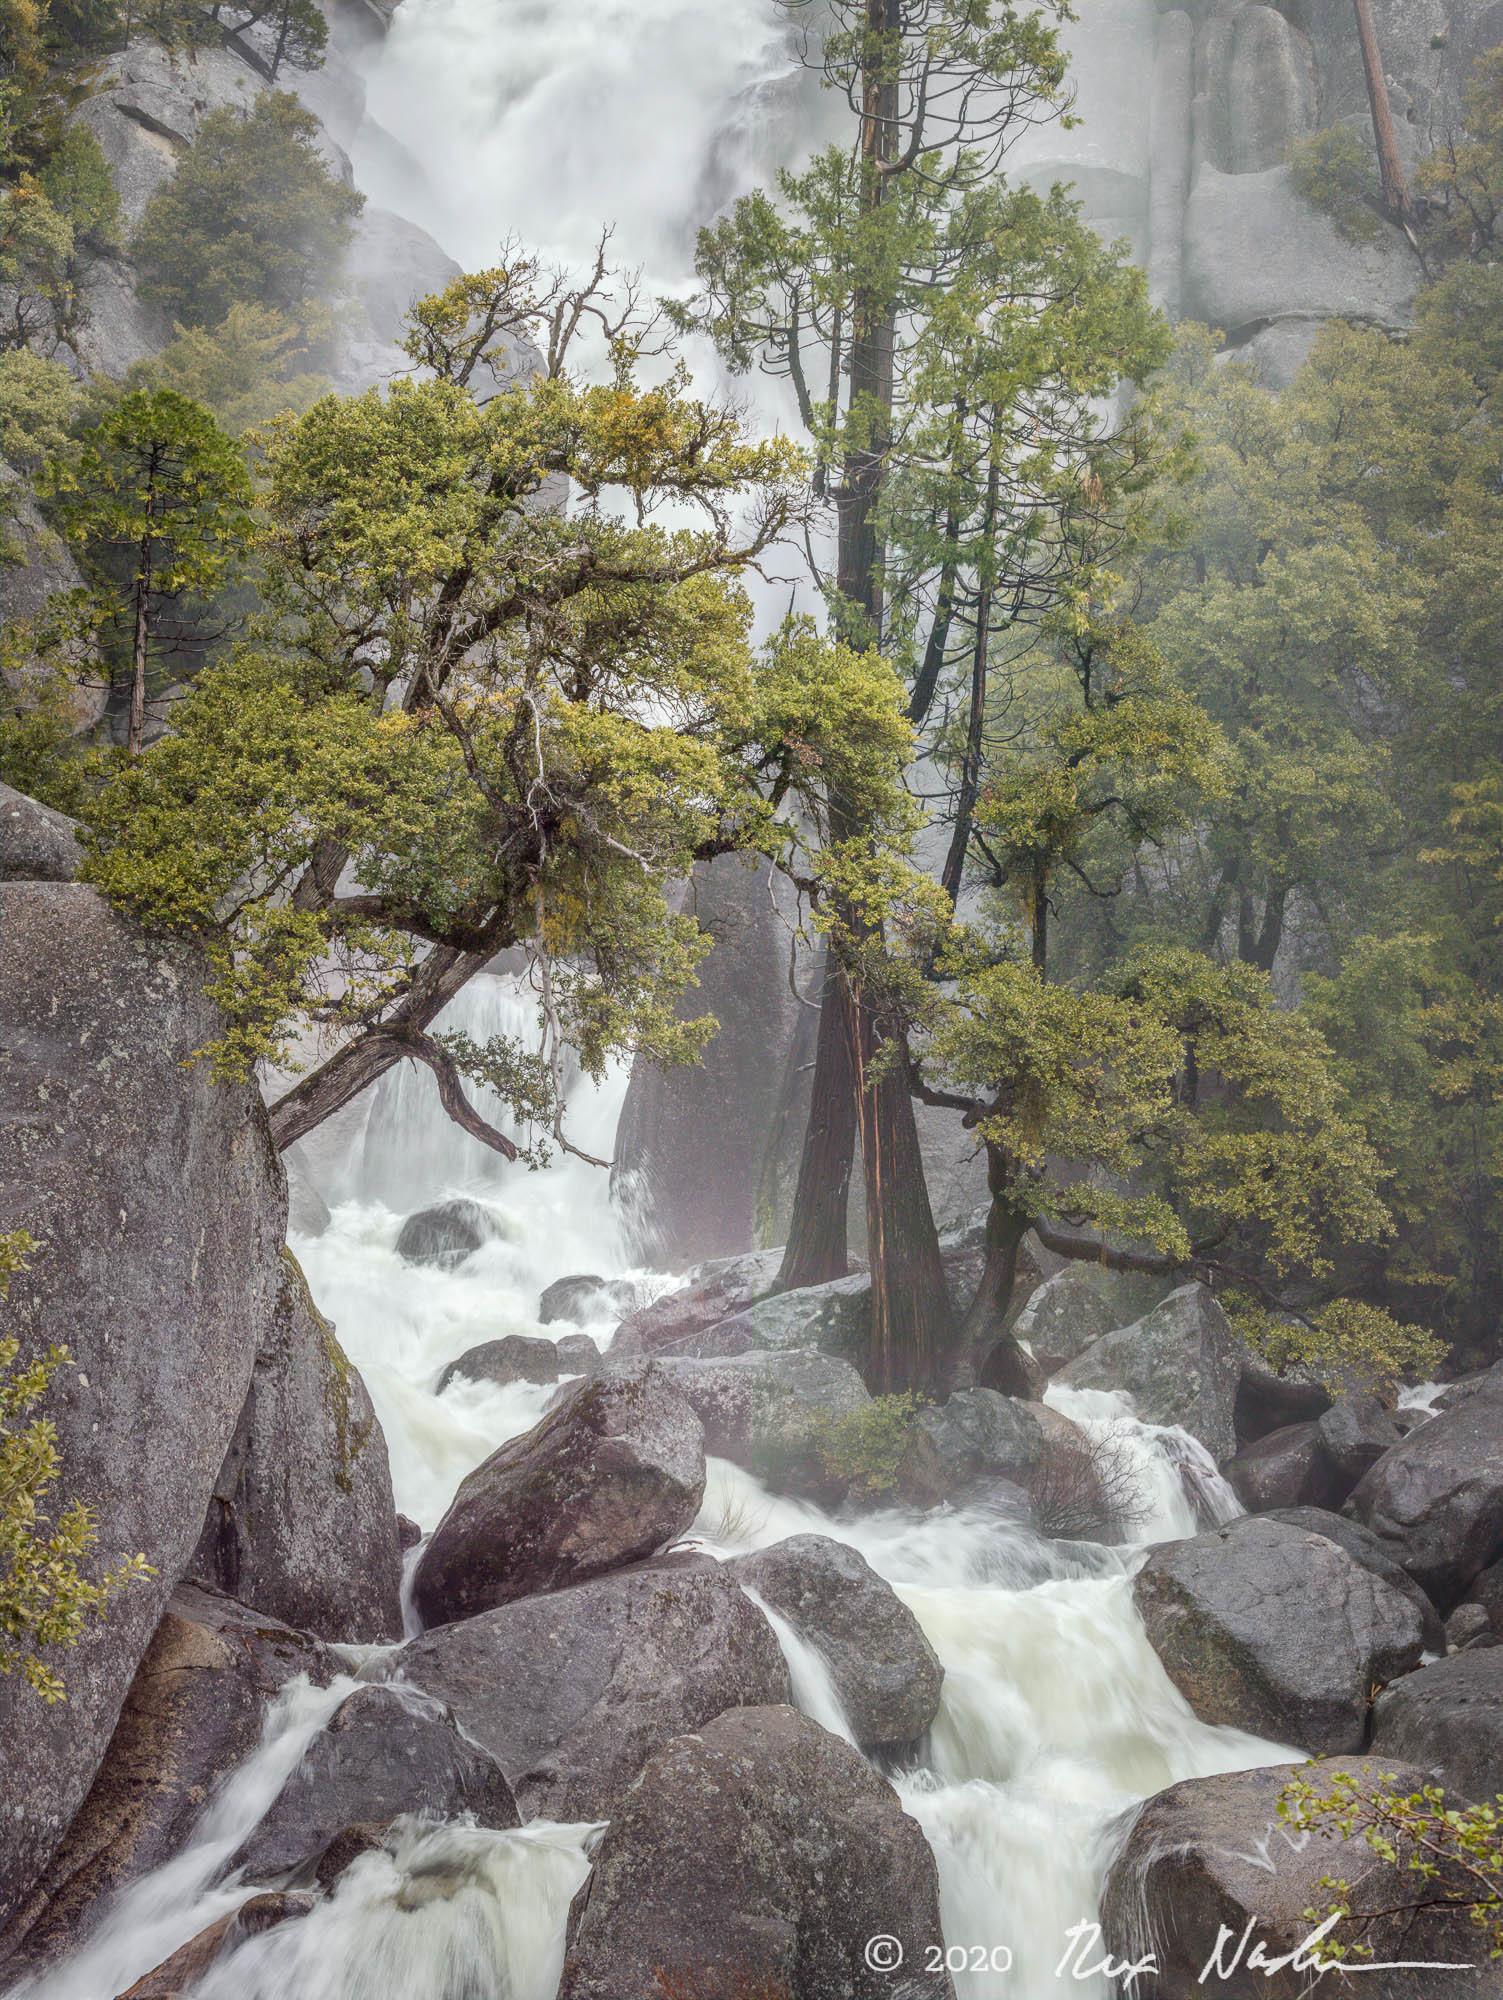 Hall of the Mountain Gods - Yosemite